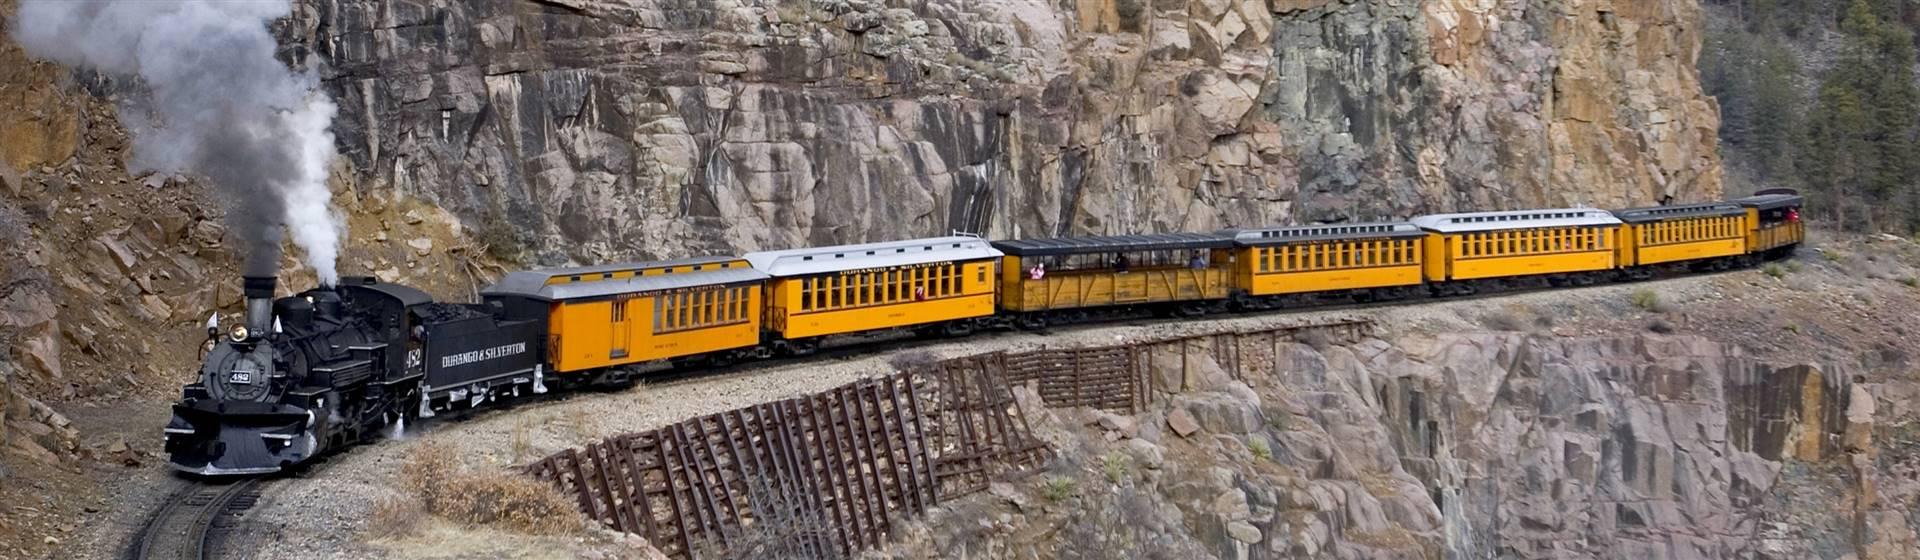 "<img src=""colorado.durangosilverton.jpeg"" alt=""Durango and Silverton steam train""/>"